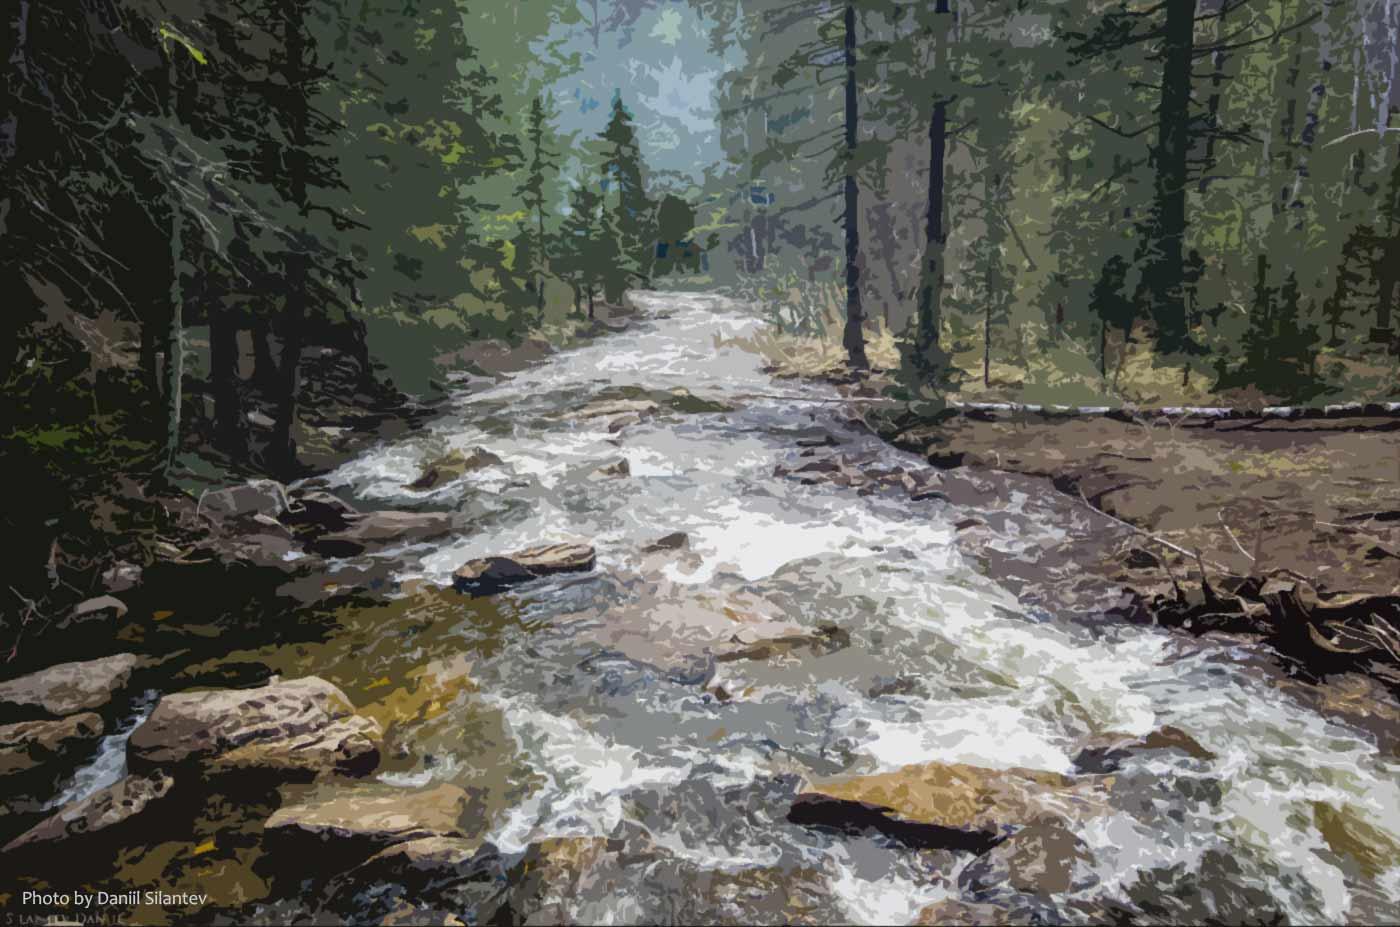 Stylized river